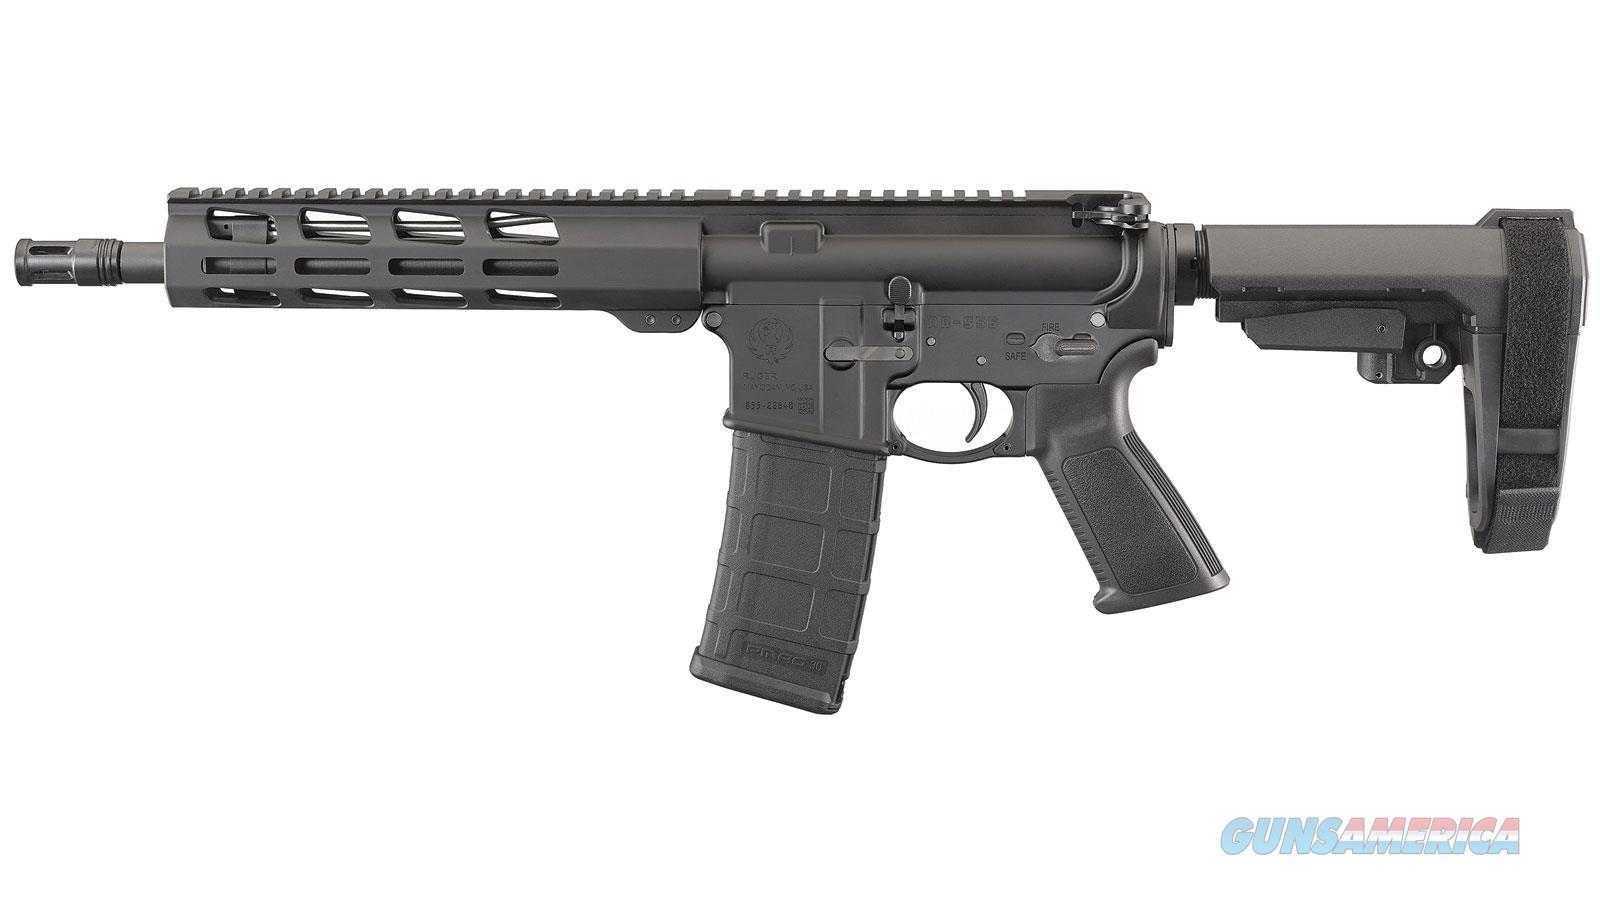 Ruger AR-556 Pistol w/Brace  Guns > Pistols > Ruger Semi-Auto Pistols > Charger Series